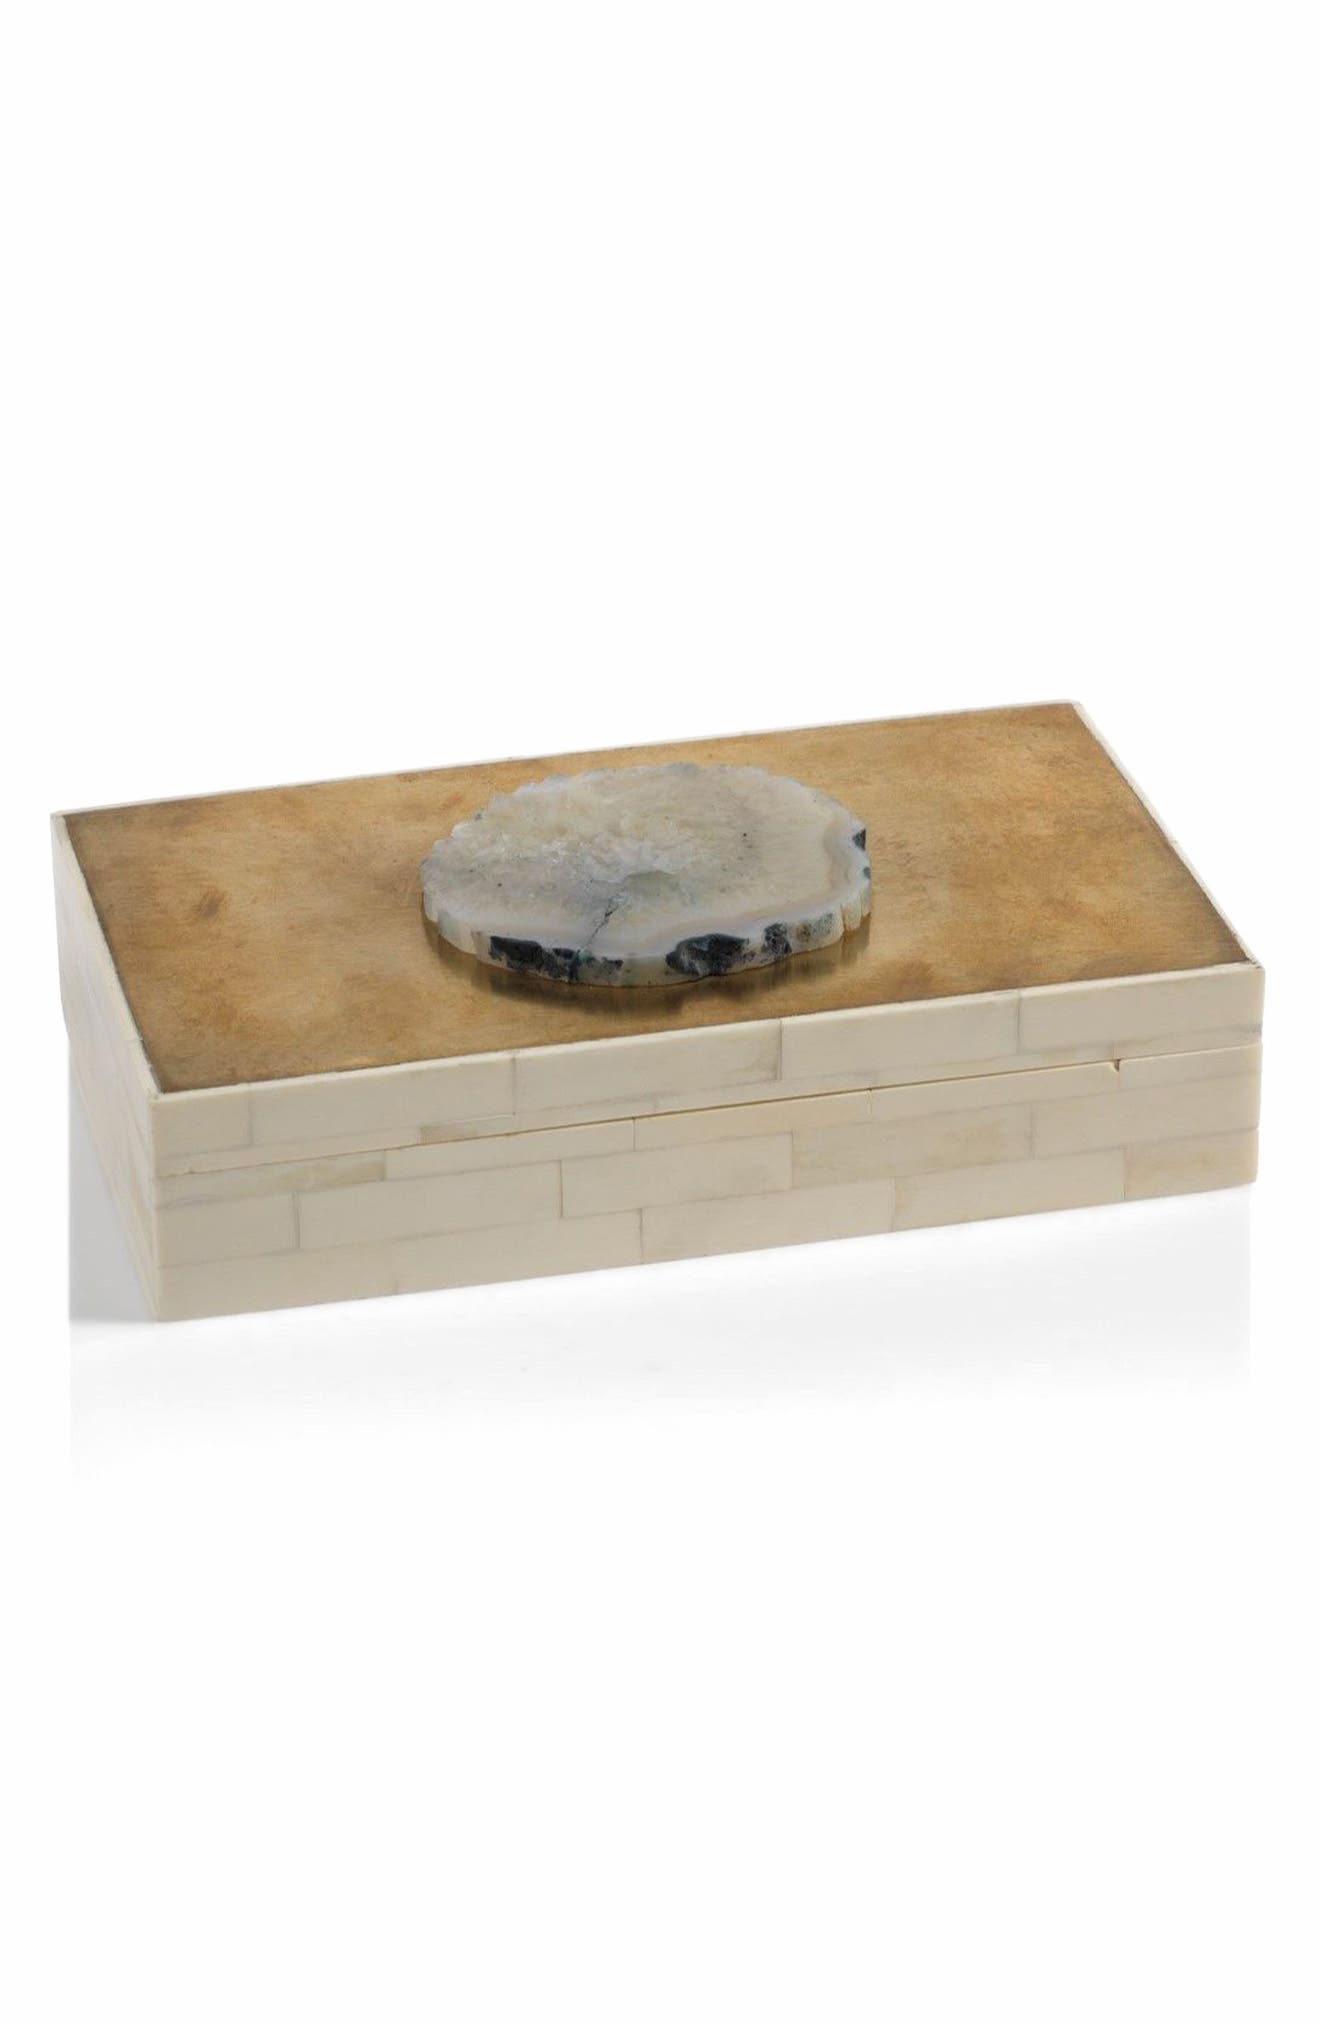 Bali Bone & Agate Jewelry Box,                             Main thumbnail 1, color,                             100